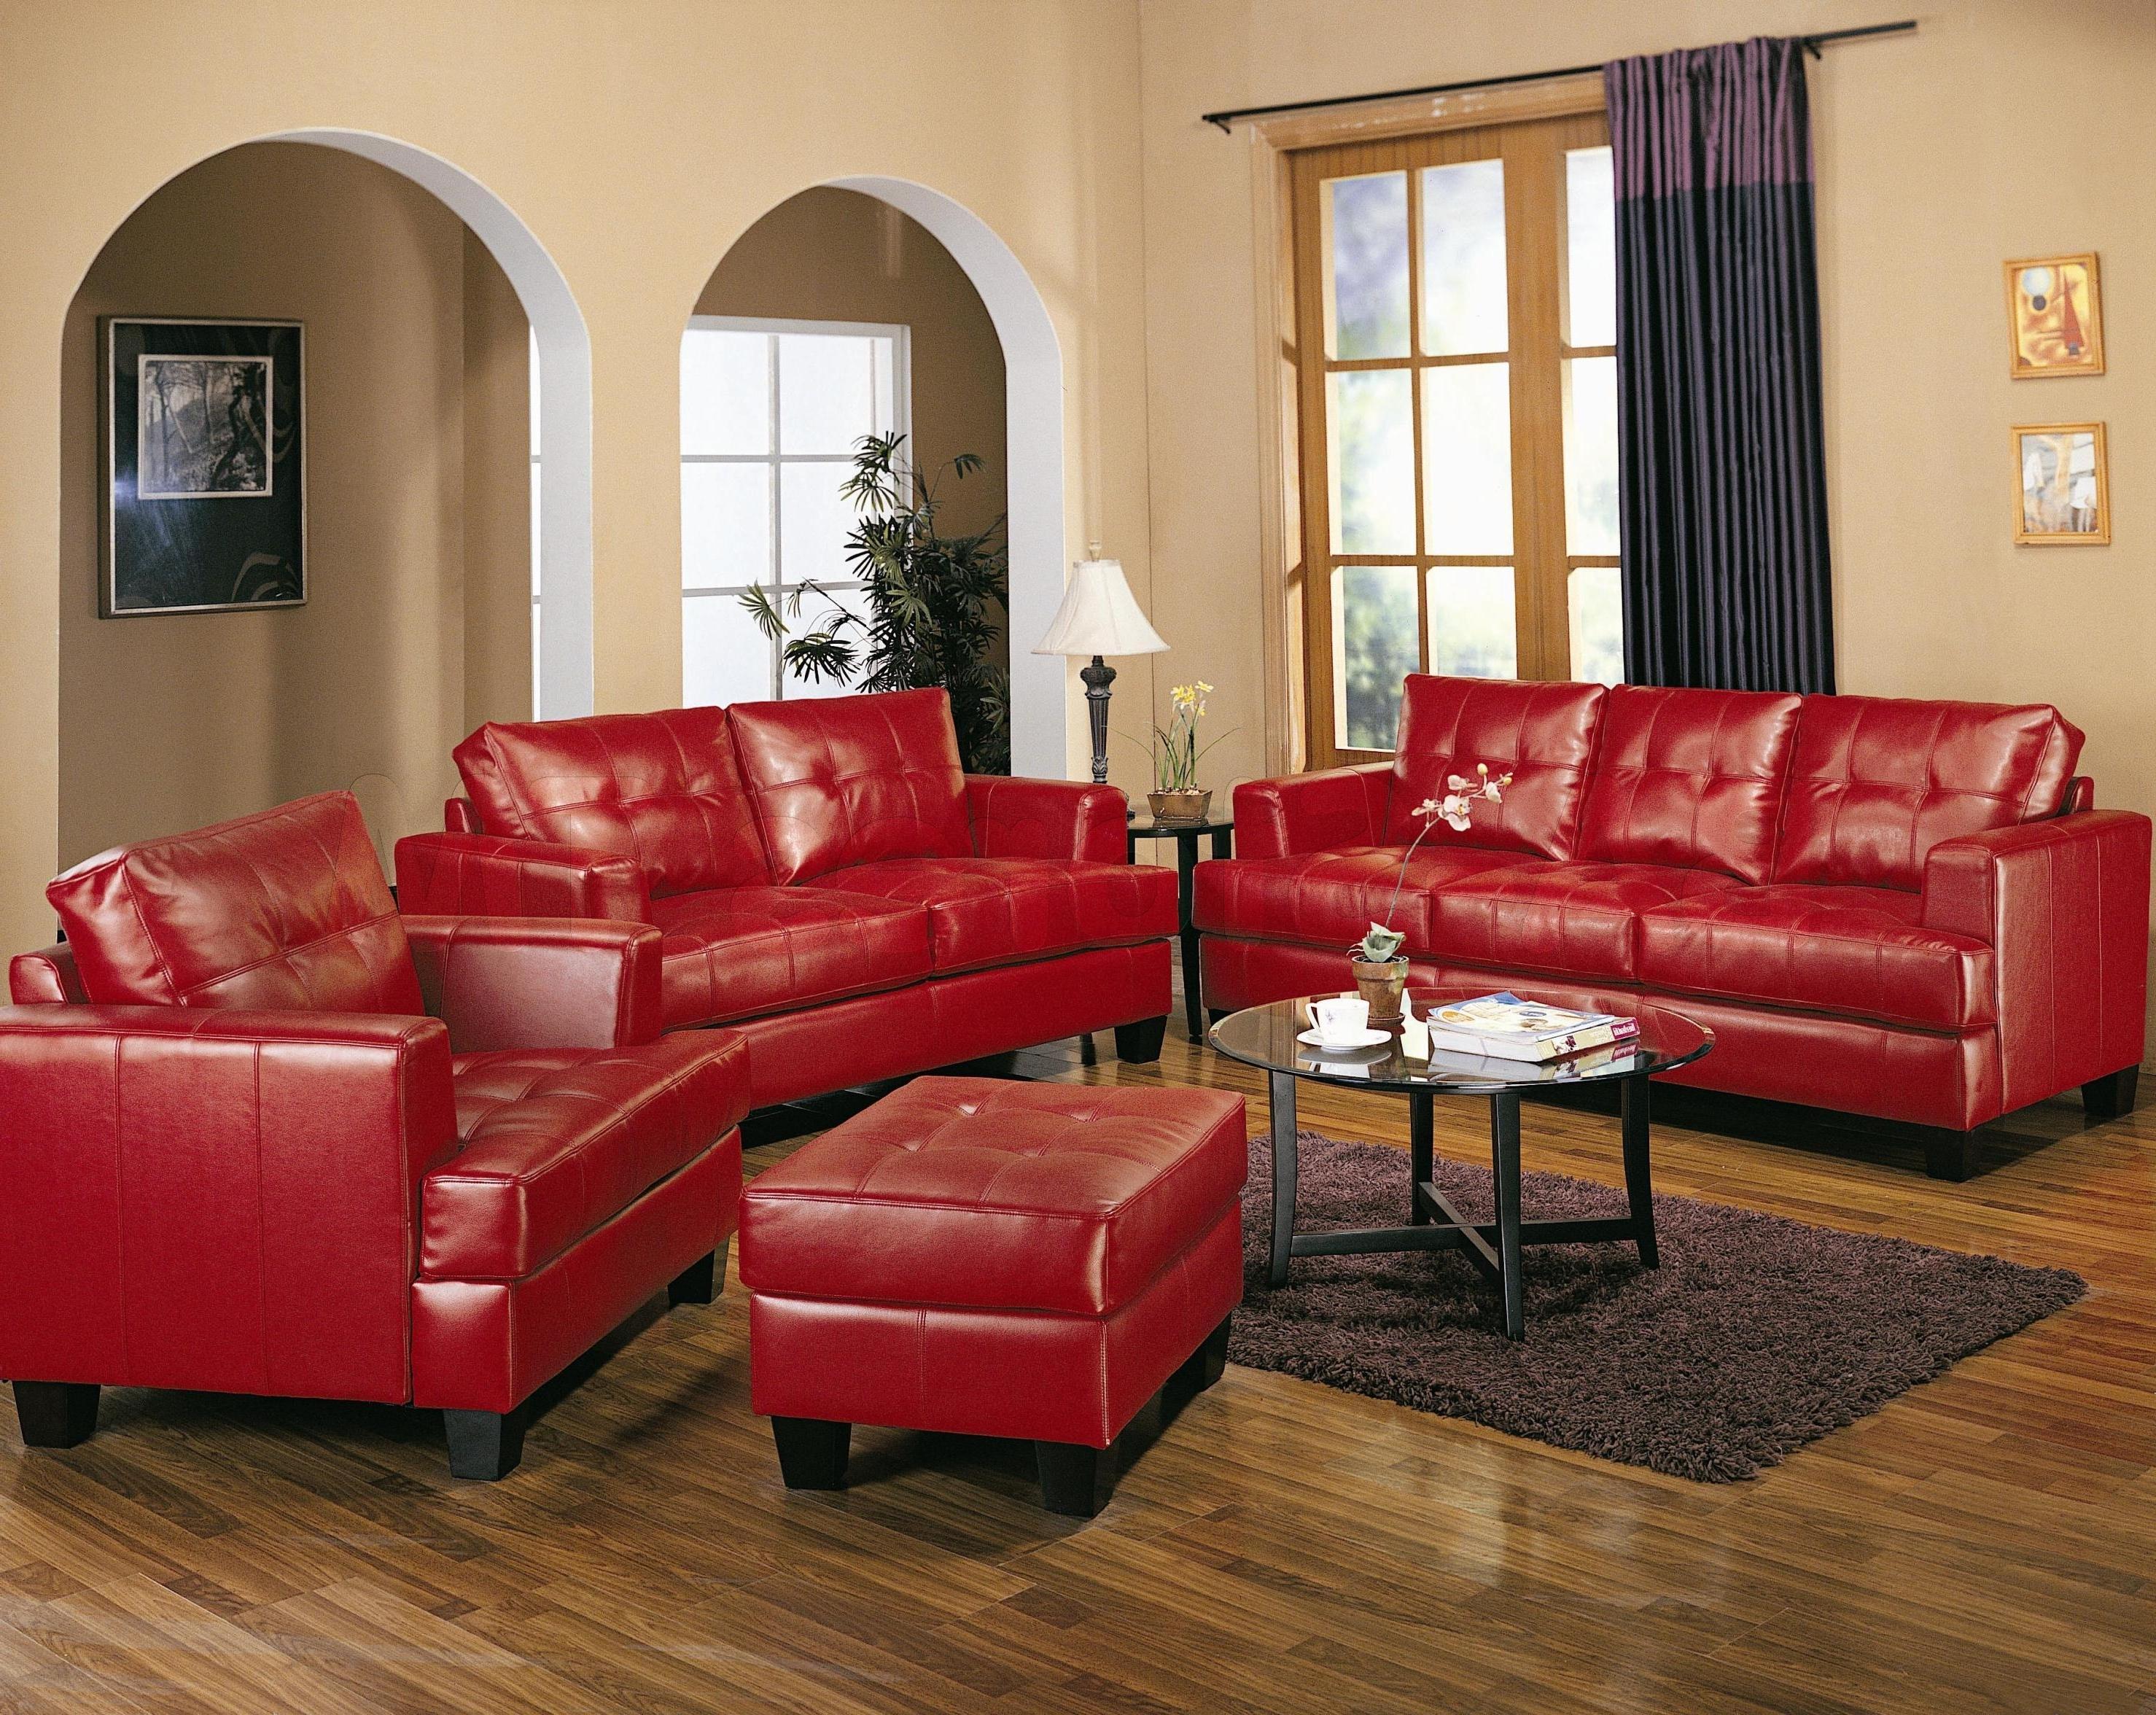 Fine Furniture (View 15 of 15)